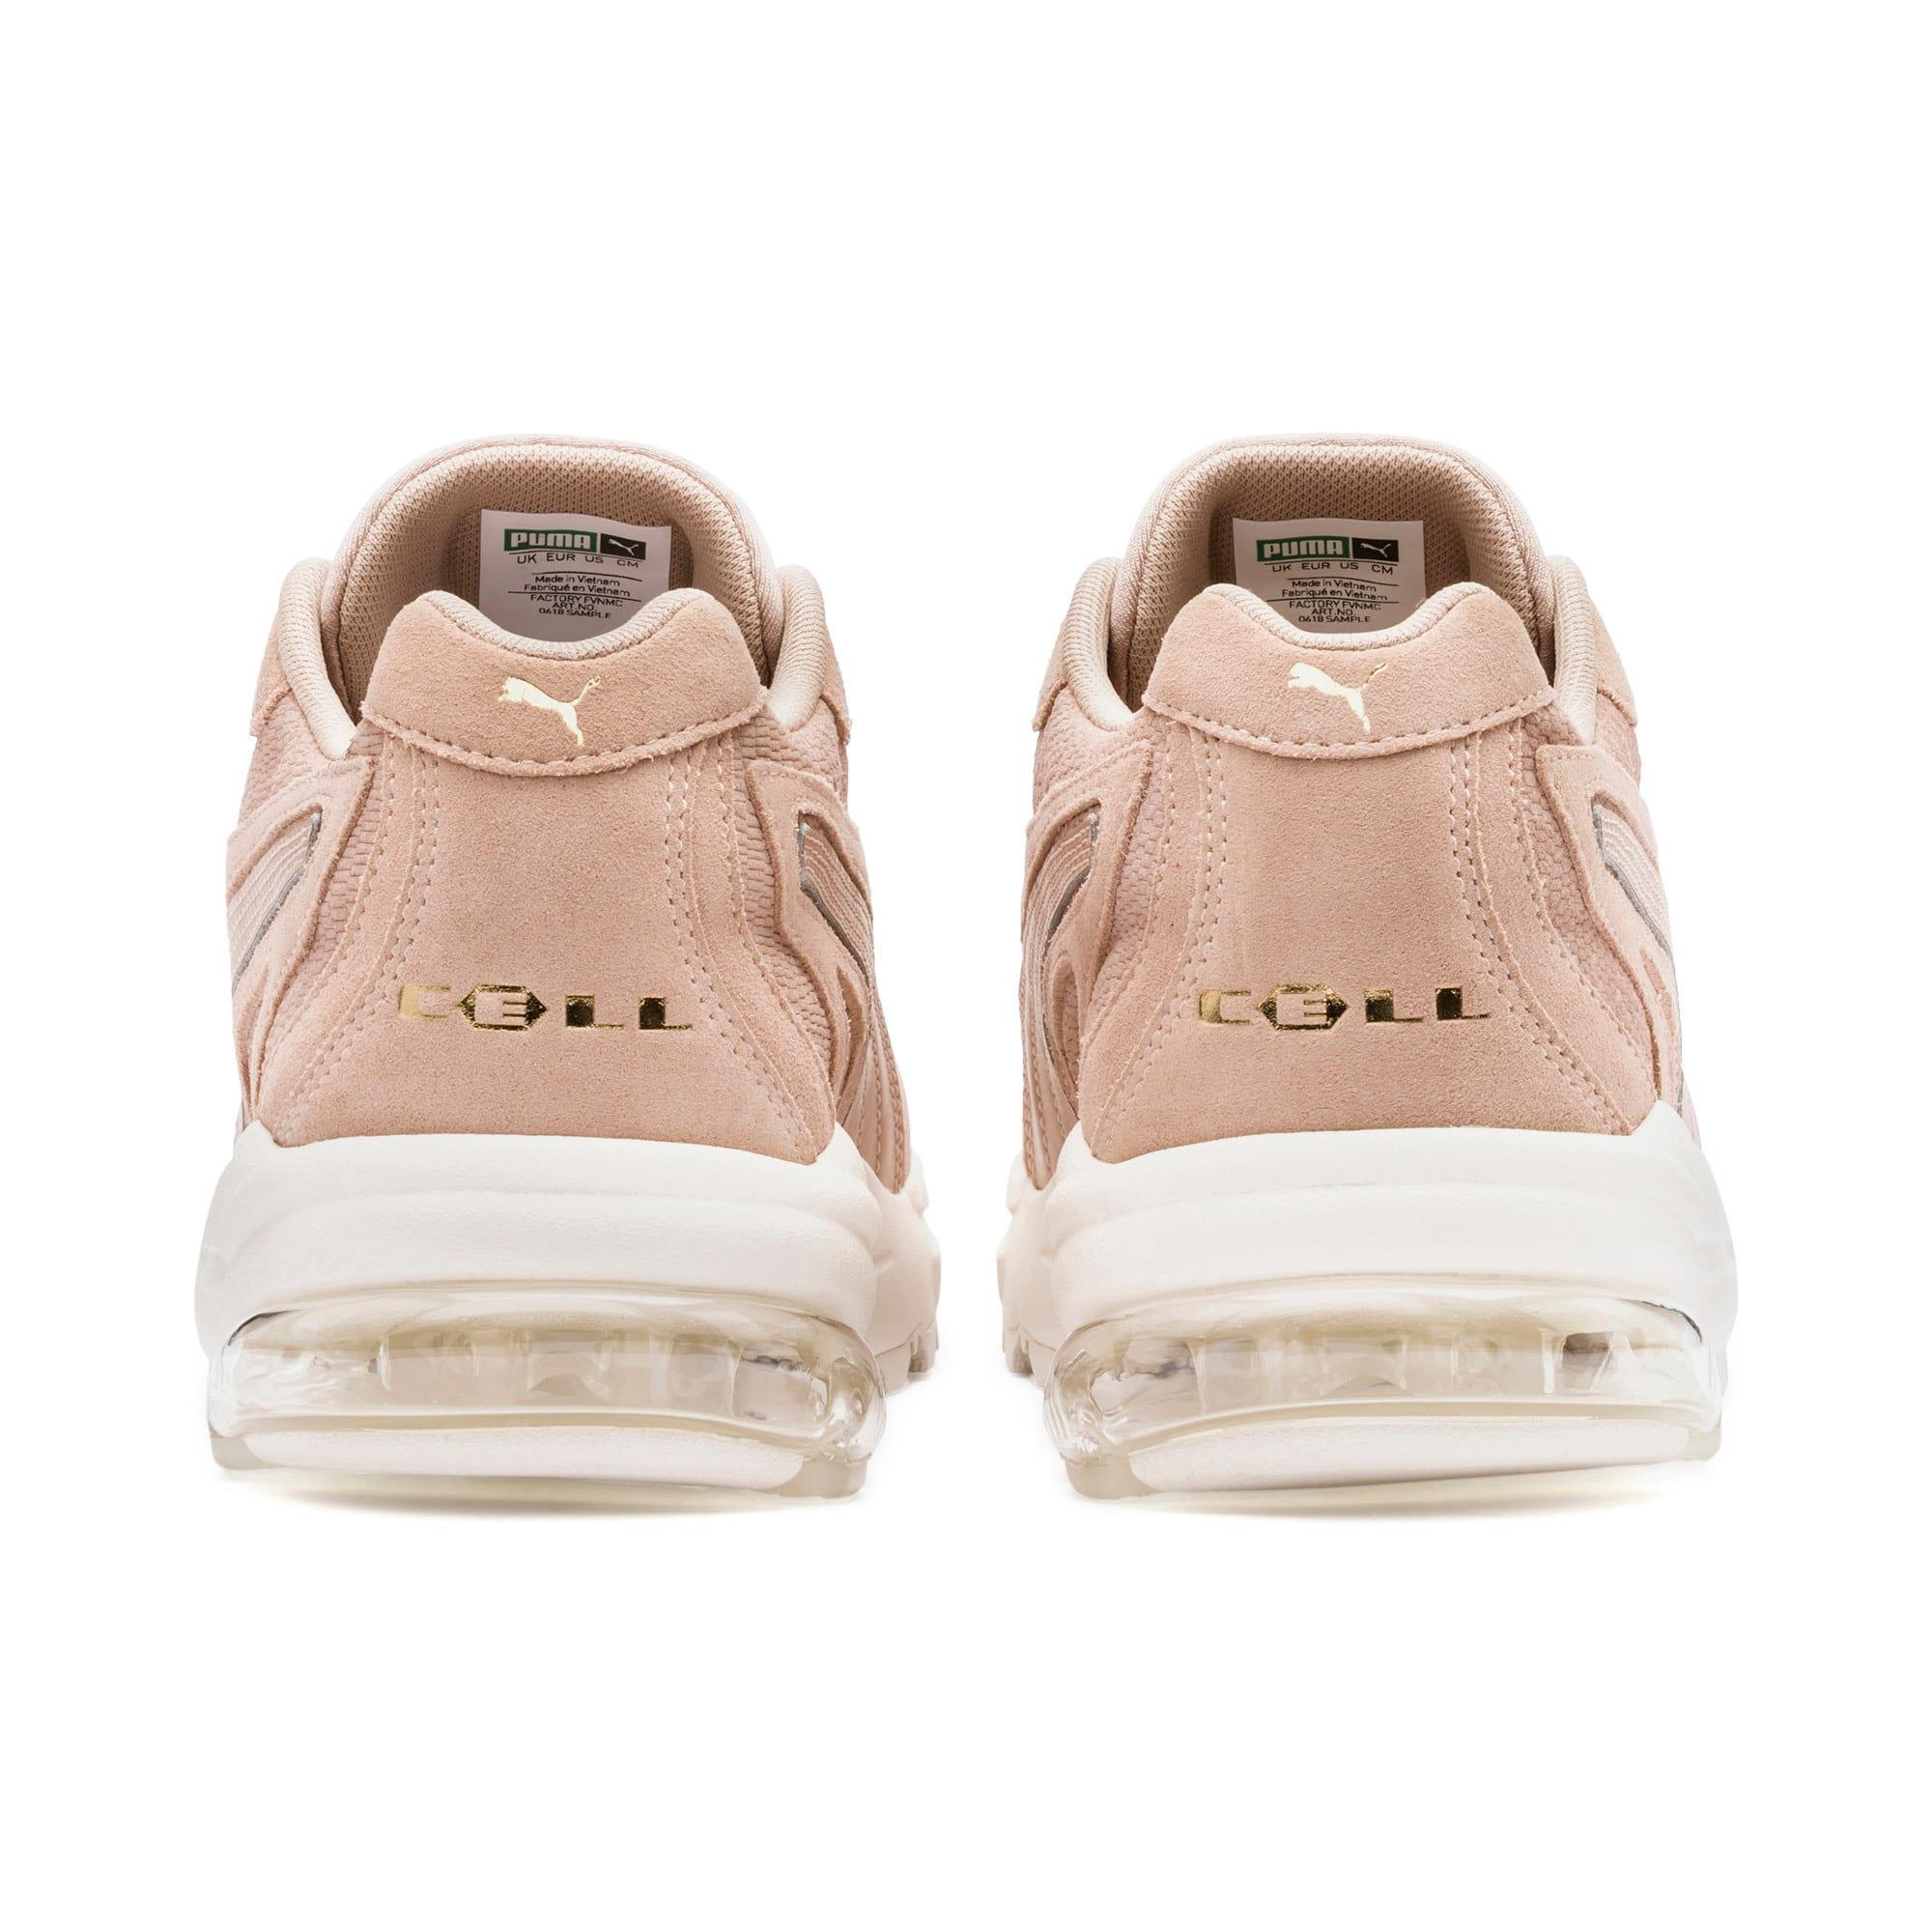 Thumbnail 5 of CELL Stellar Tonal Women's Sneakers, Nougat-Puma Team Gold, medium